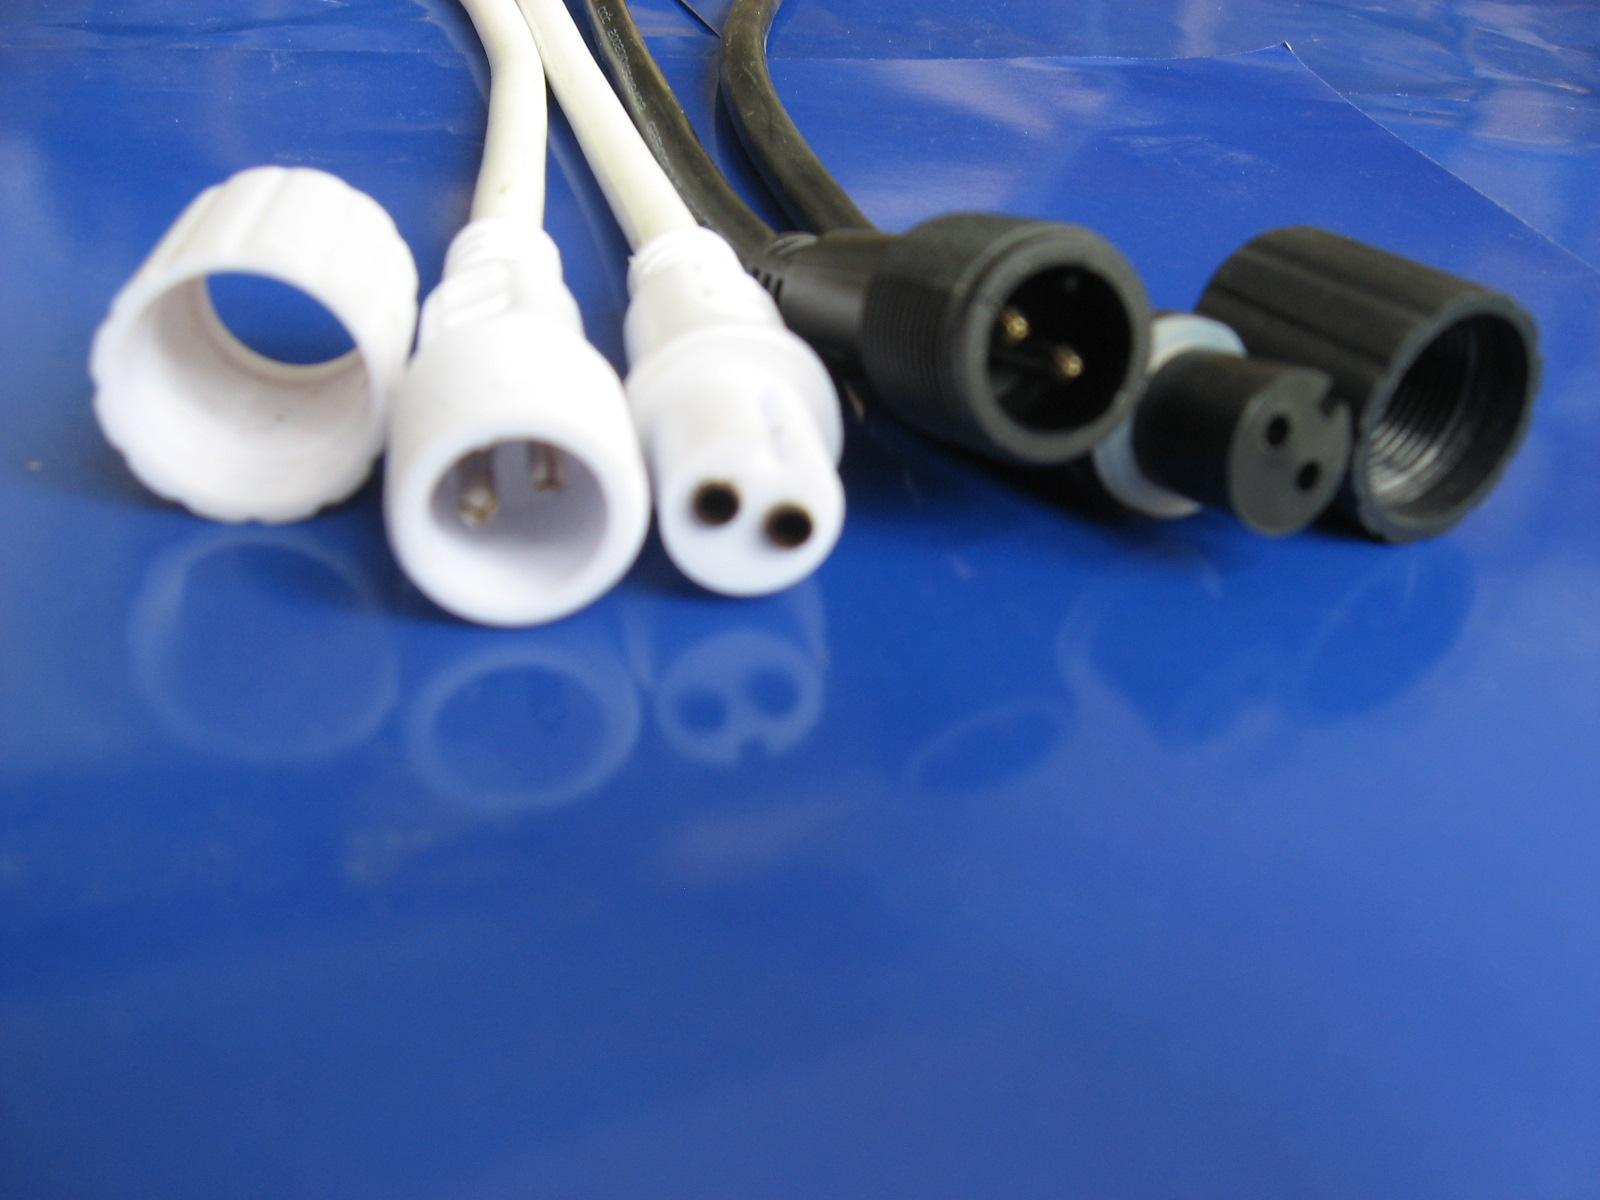 供应LED灯饰防水连接器LED灯饰防水连接器系列